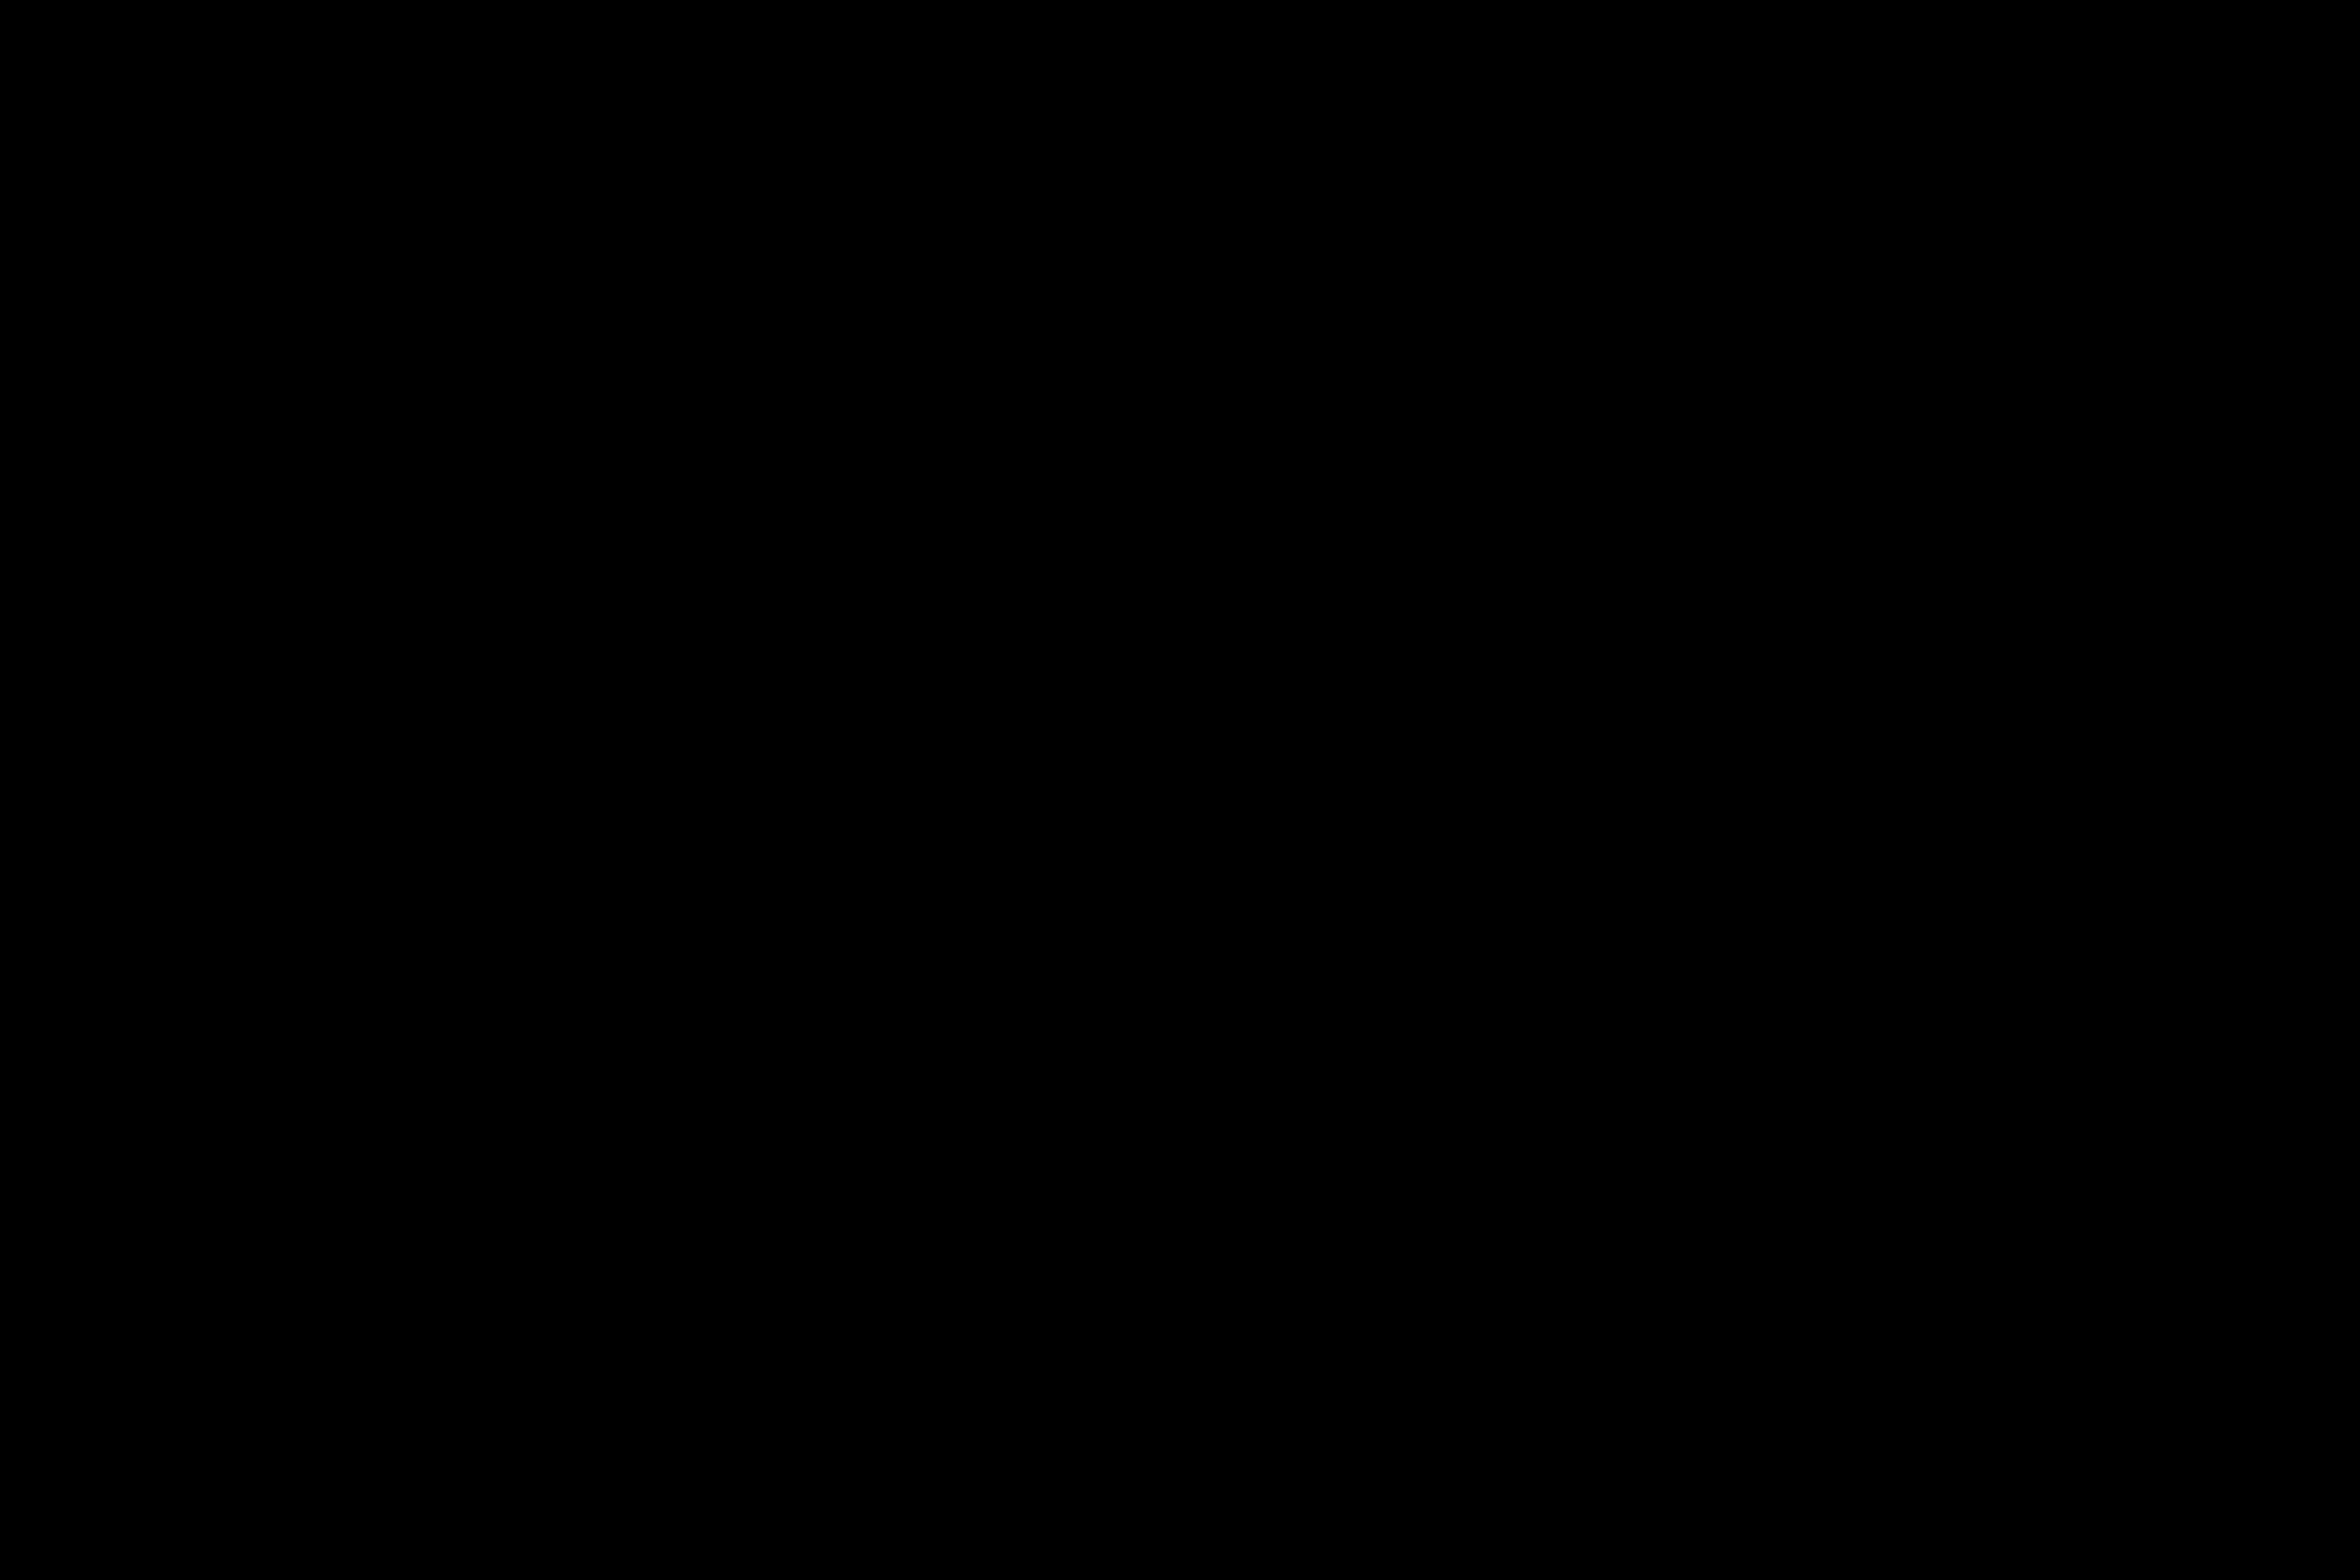 rj0176